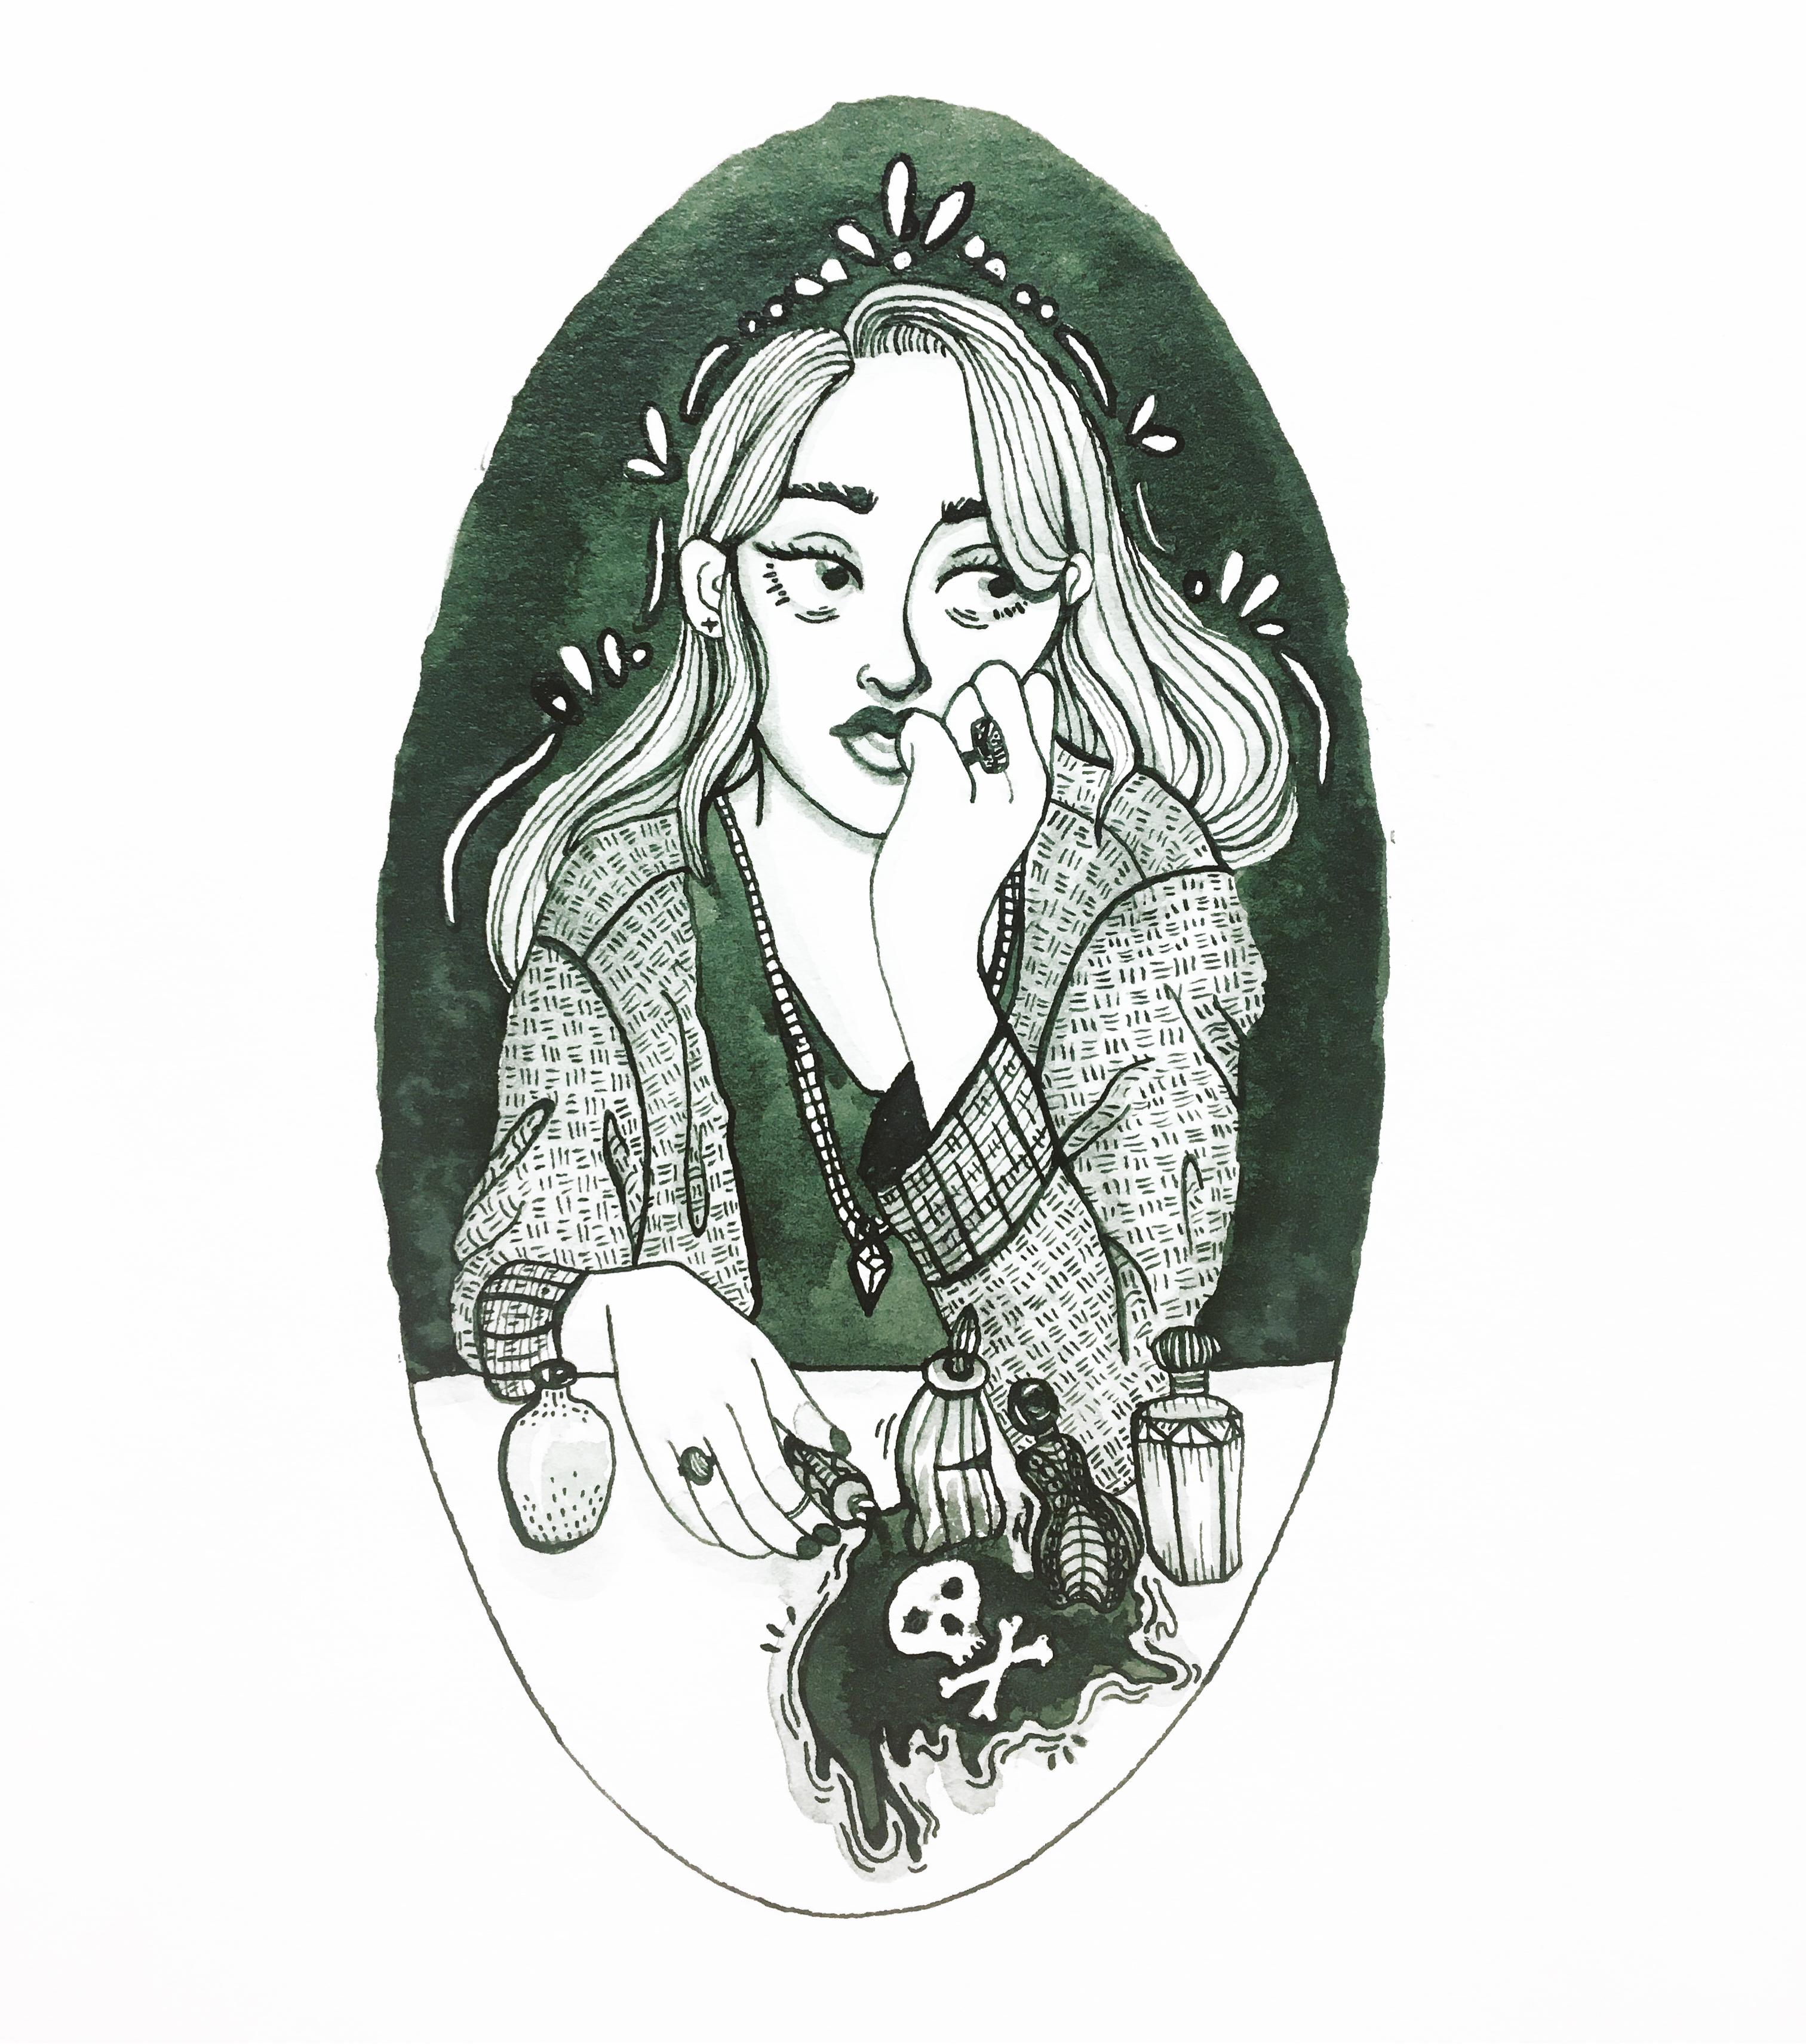 An ink illustration of a girl spilling poison.